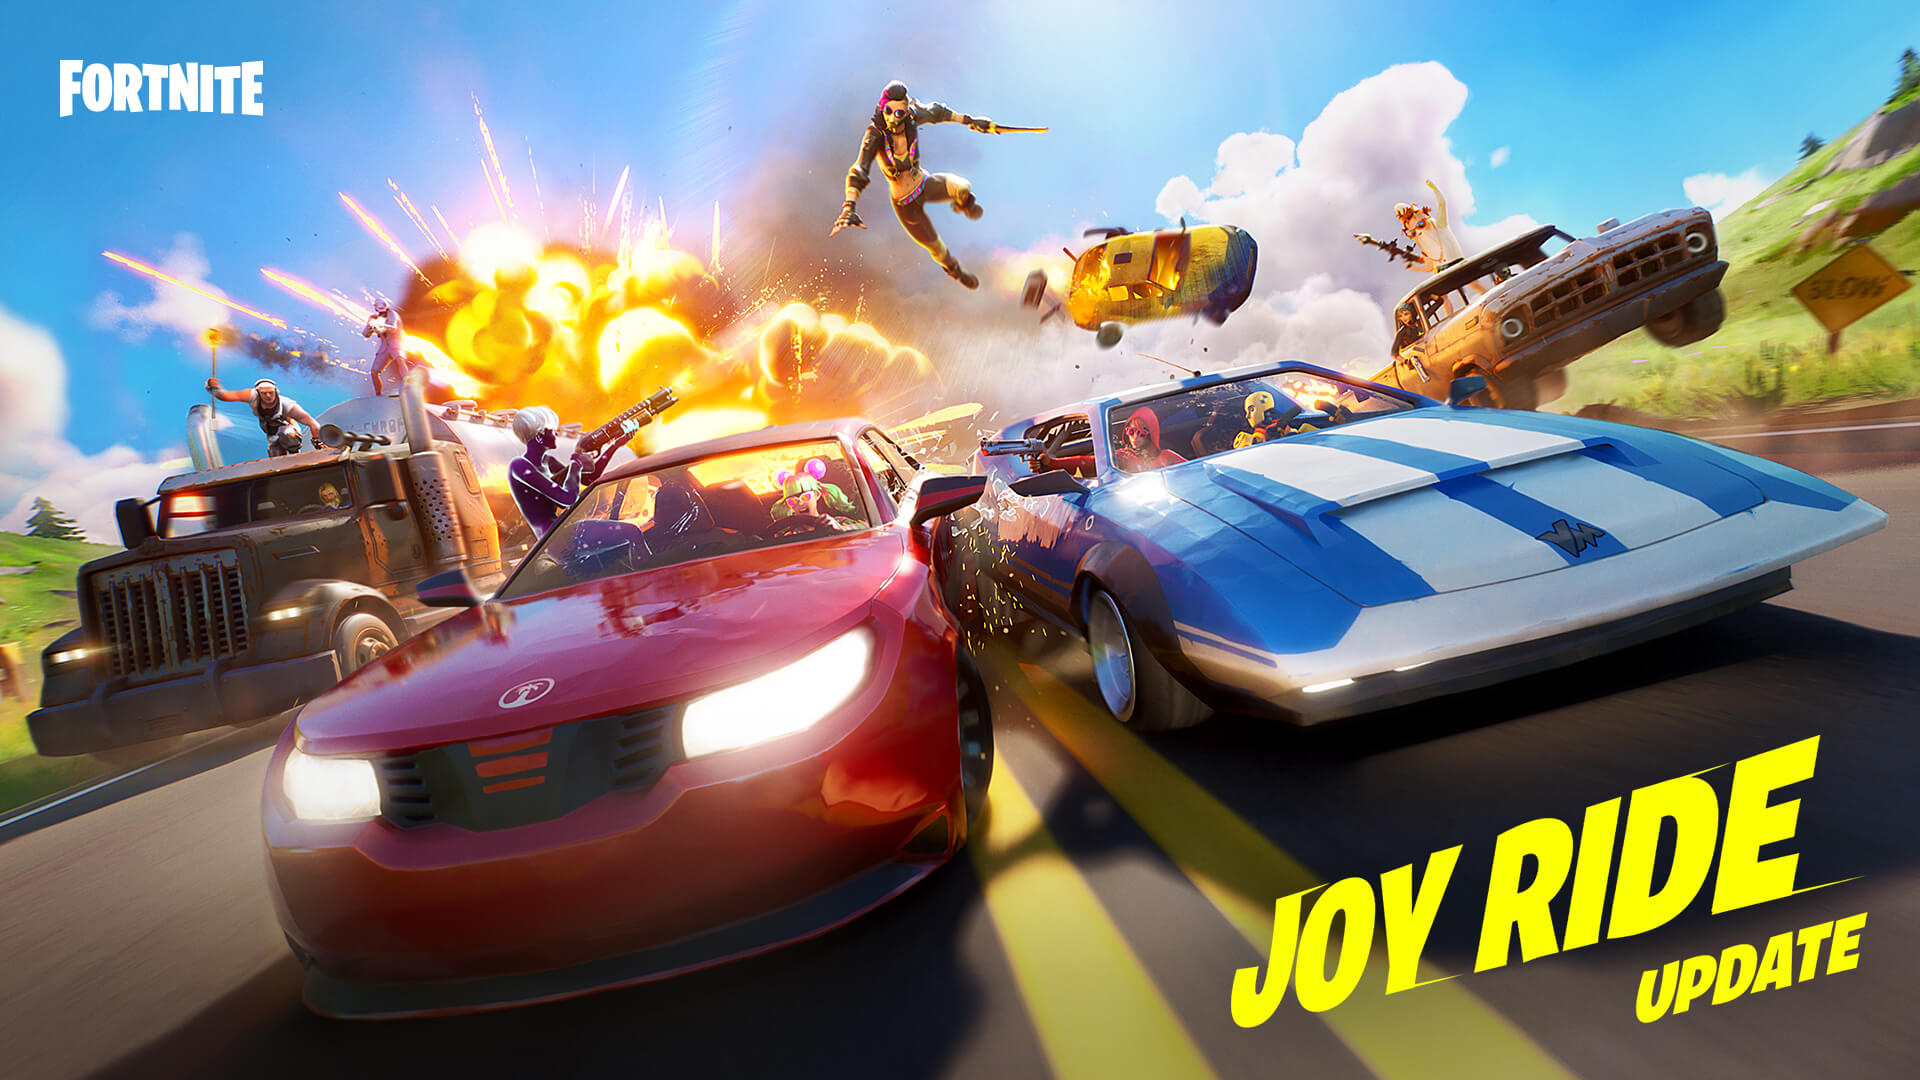 Fortnite Joy Ride Update